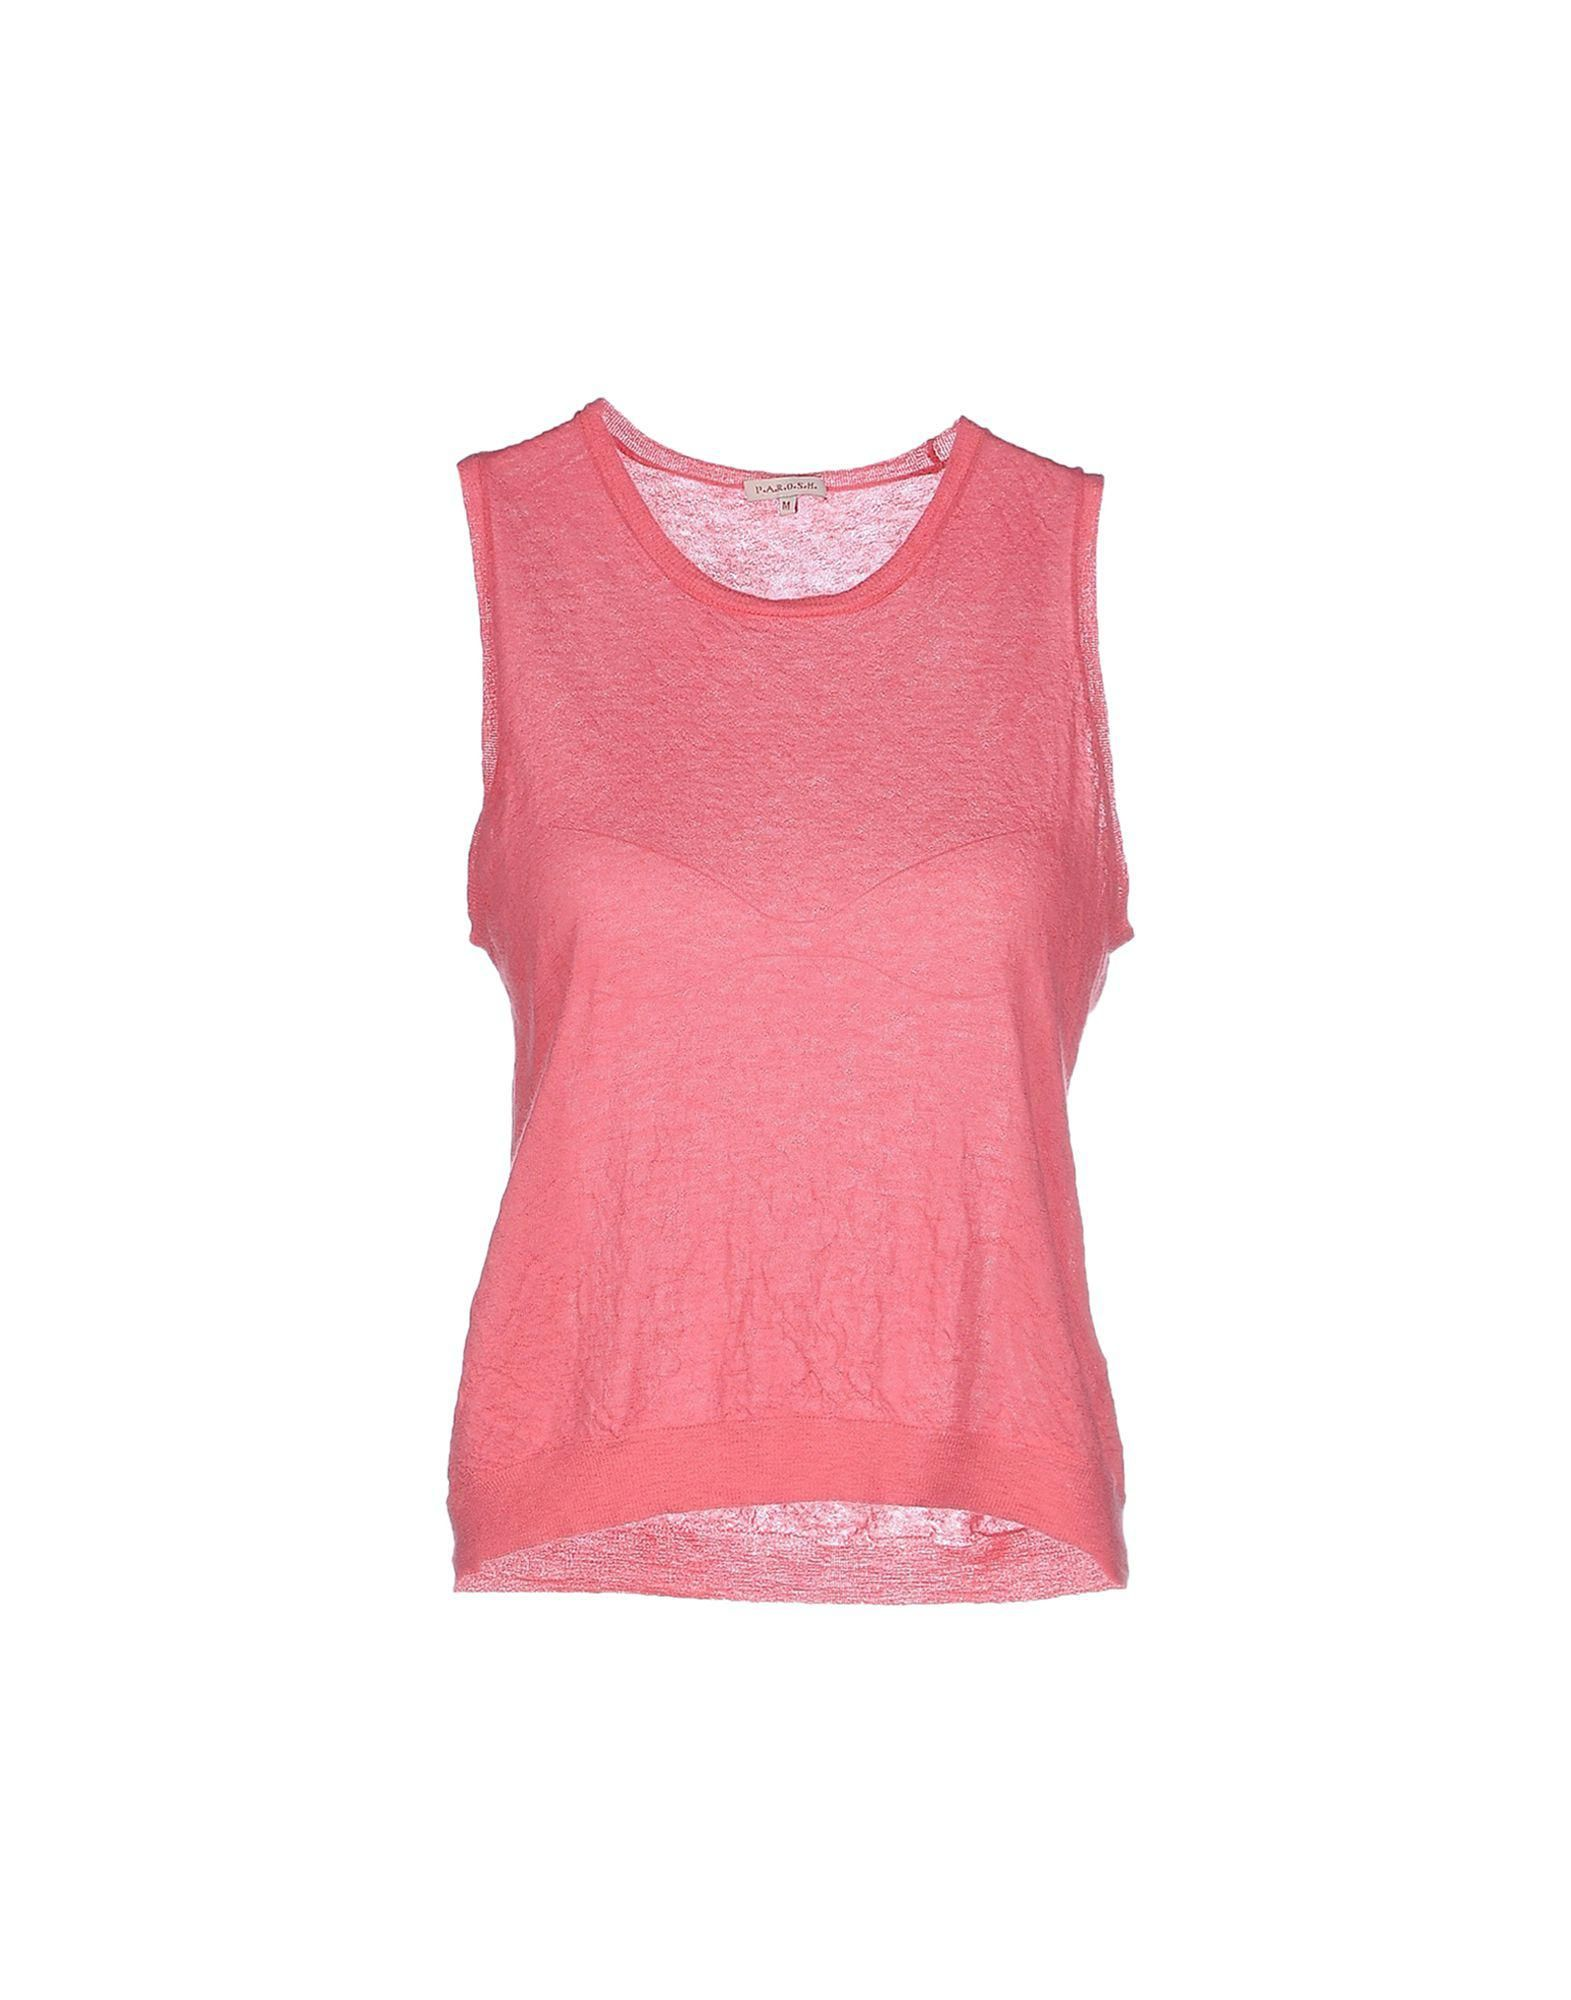 90df8c5c8 Women's Purple Jumper | sleeveless sweaters | Tank tops, Tops, Jumper